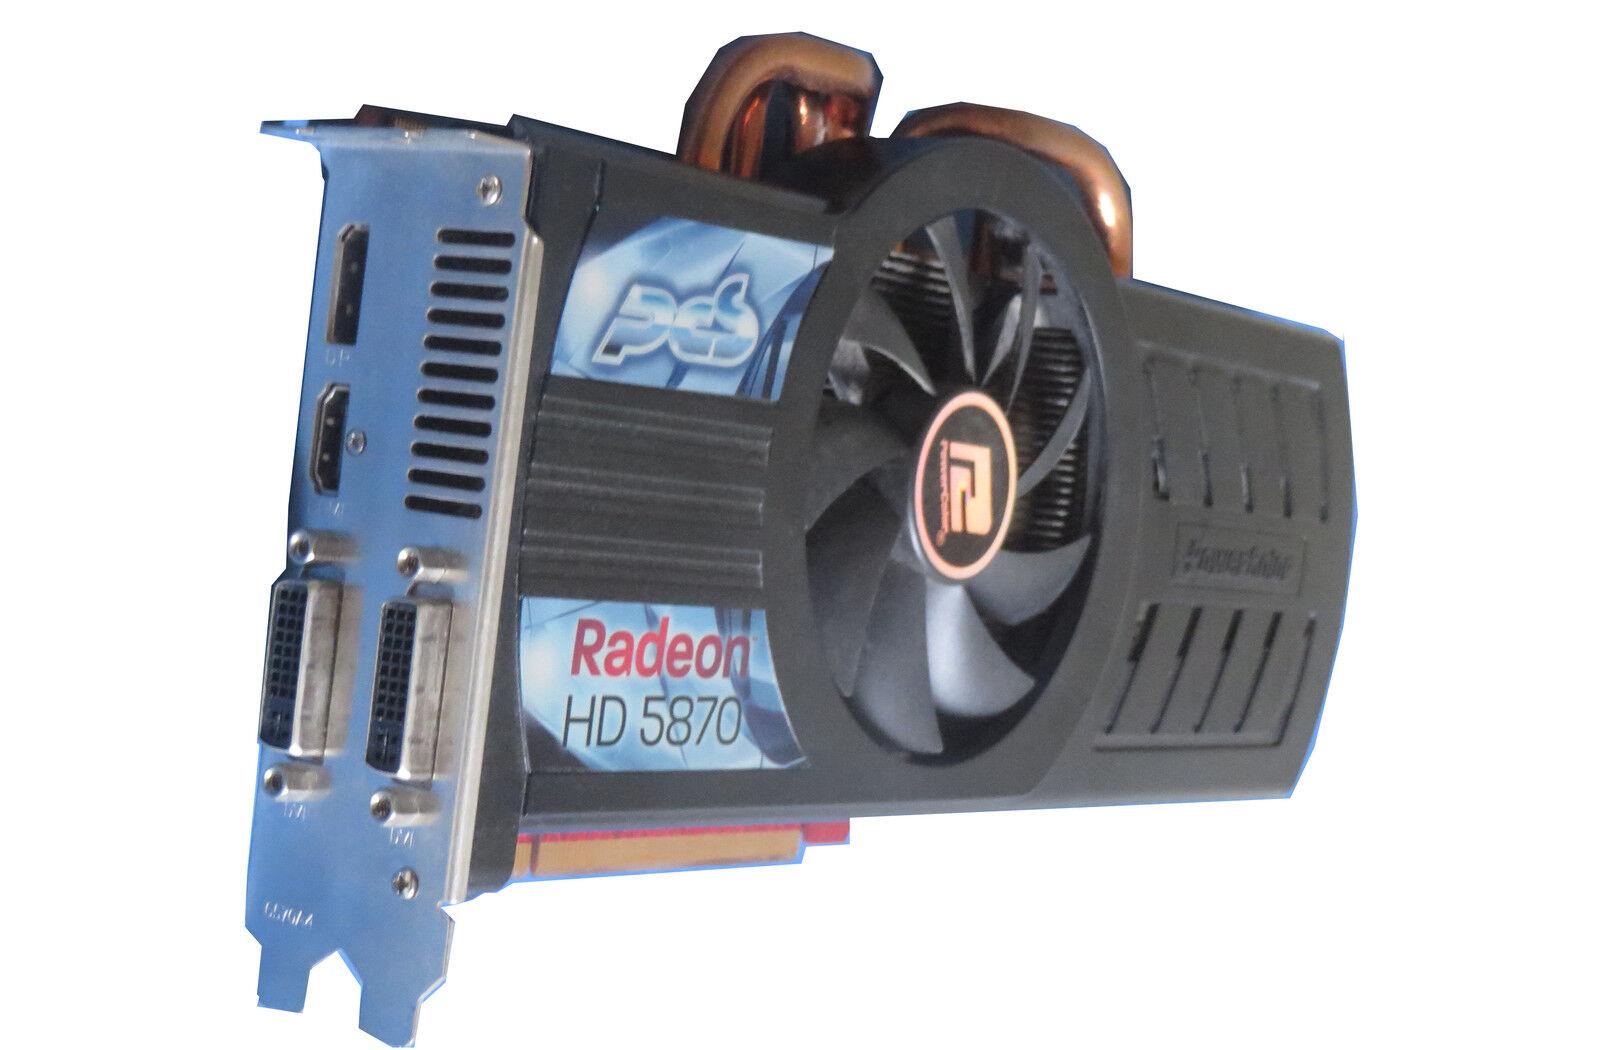 PCS PowerColor Grafikkarte Radeon HD 5870 1GB PCIe für PC/Mac Pro 1.1/5.1 #90